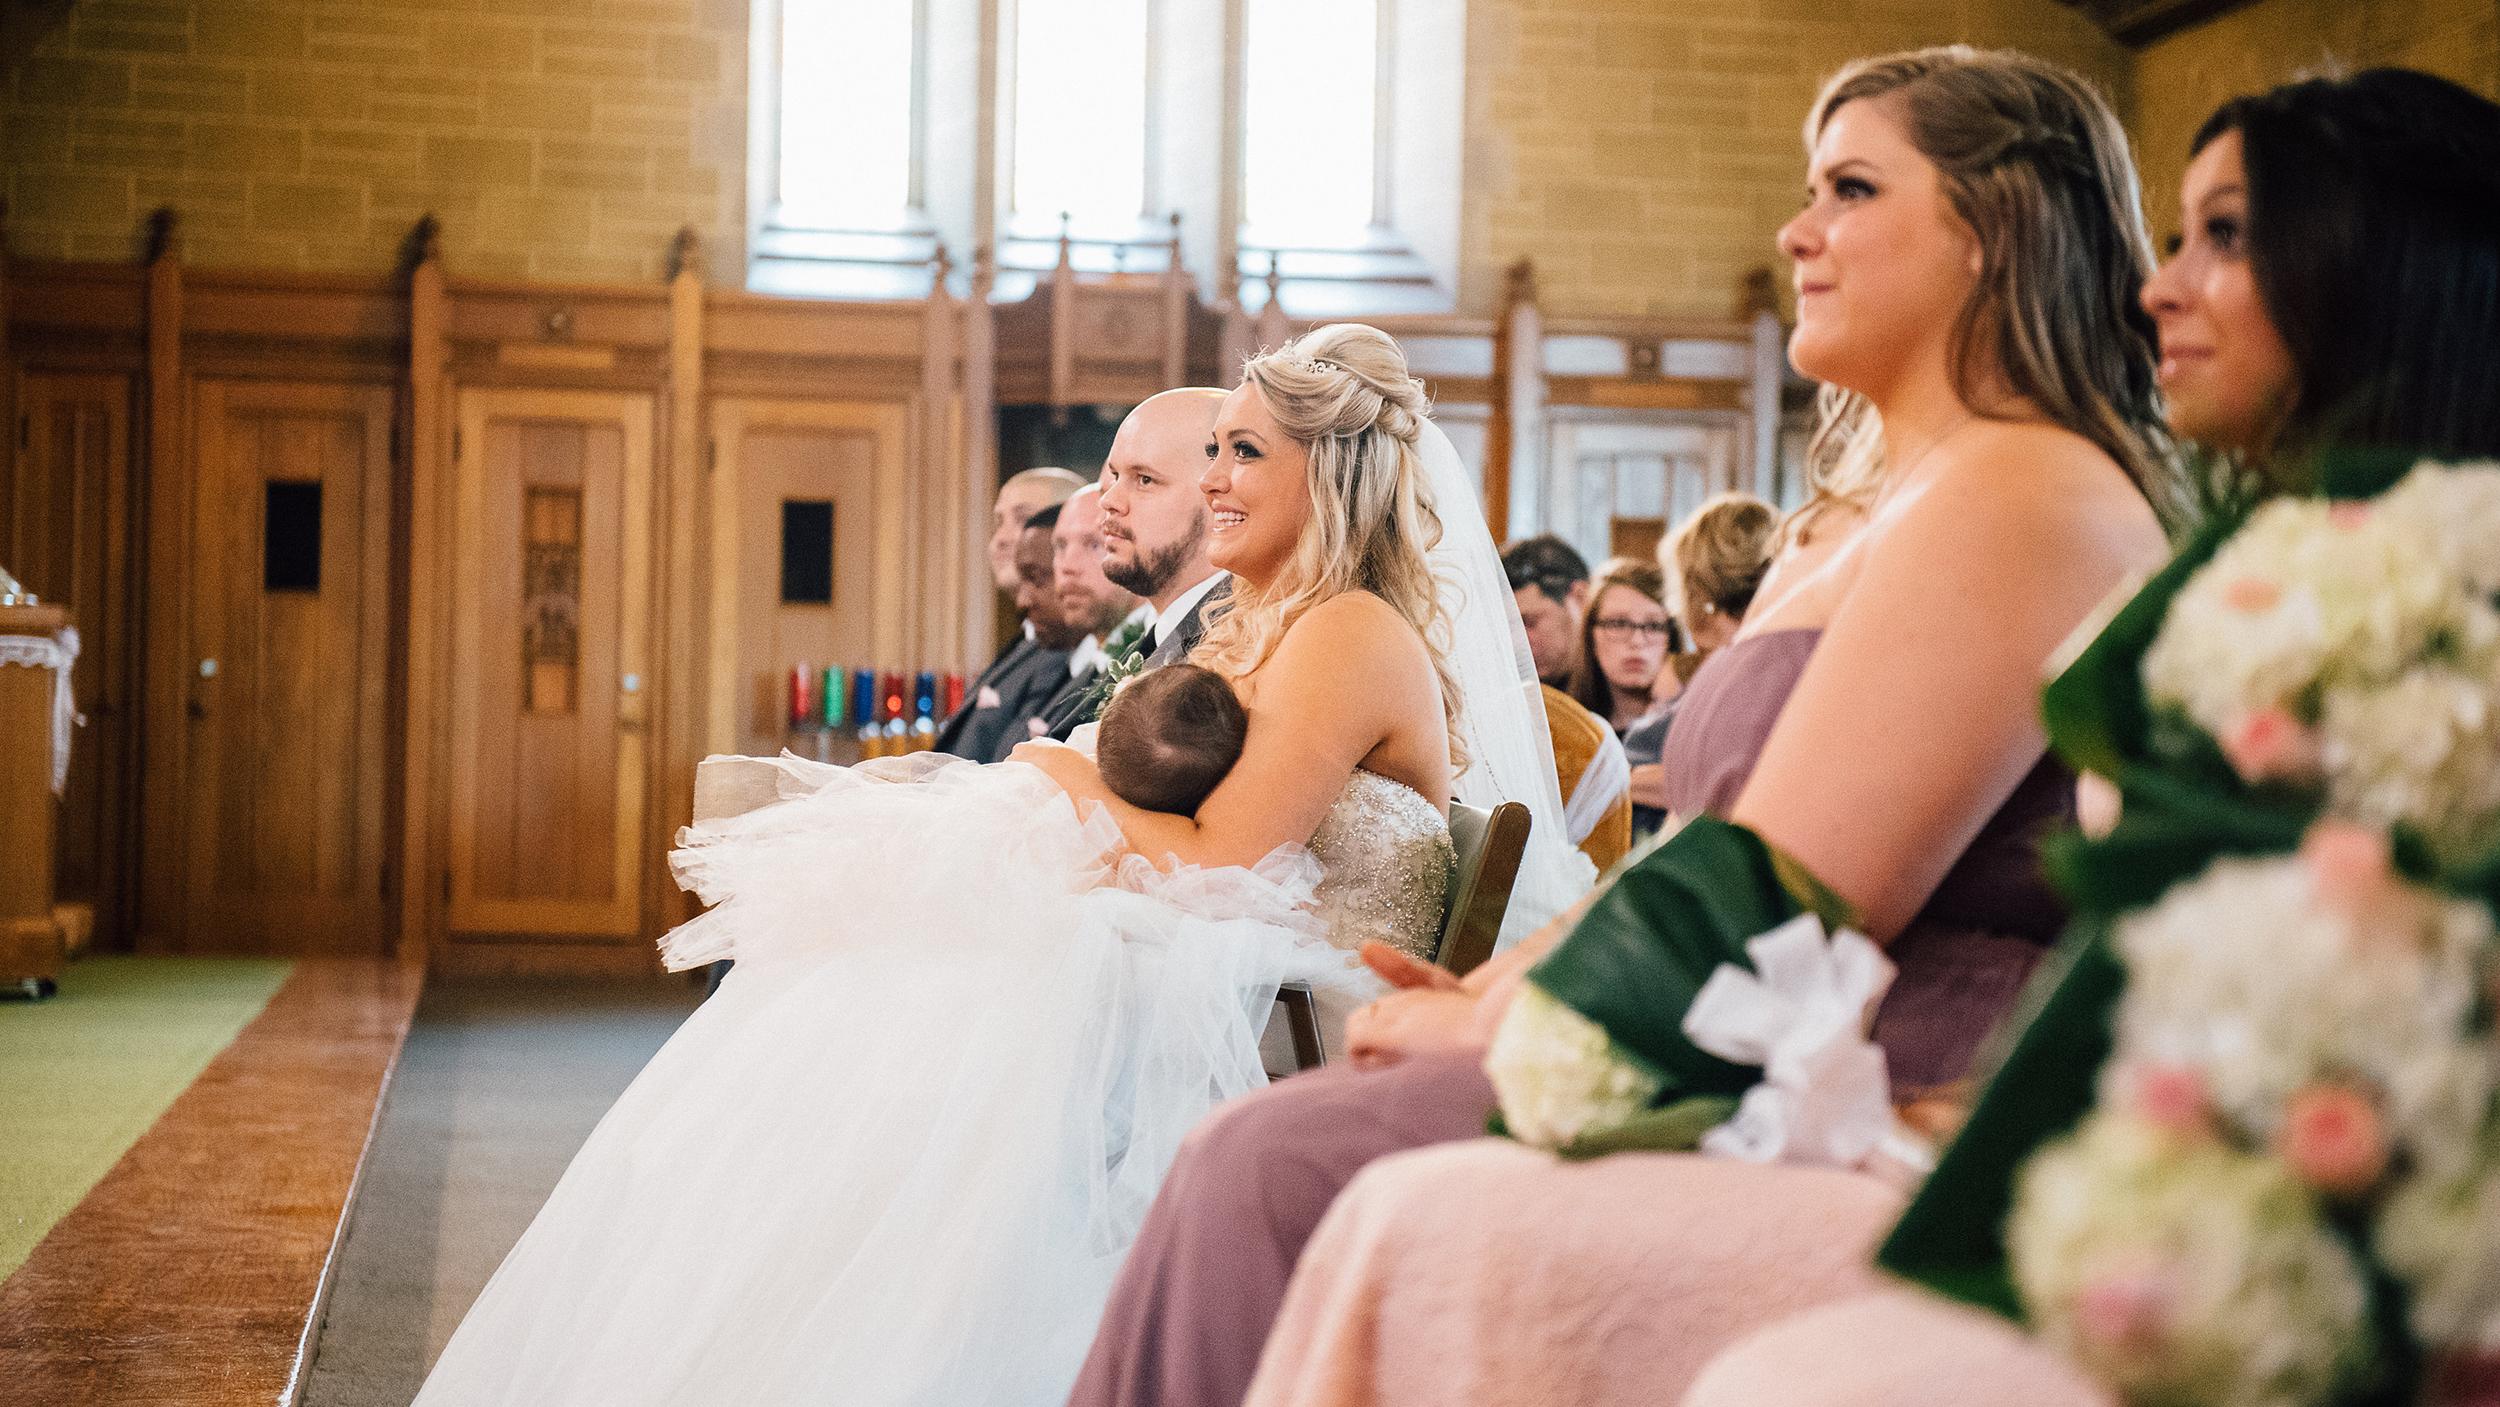 Wedding dress colors different cultures in nursing